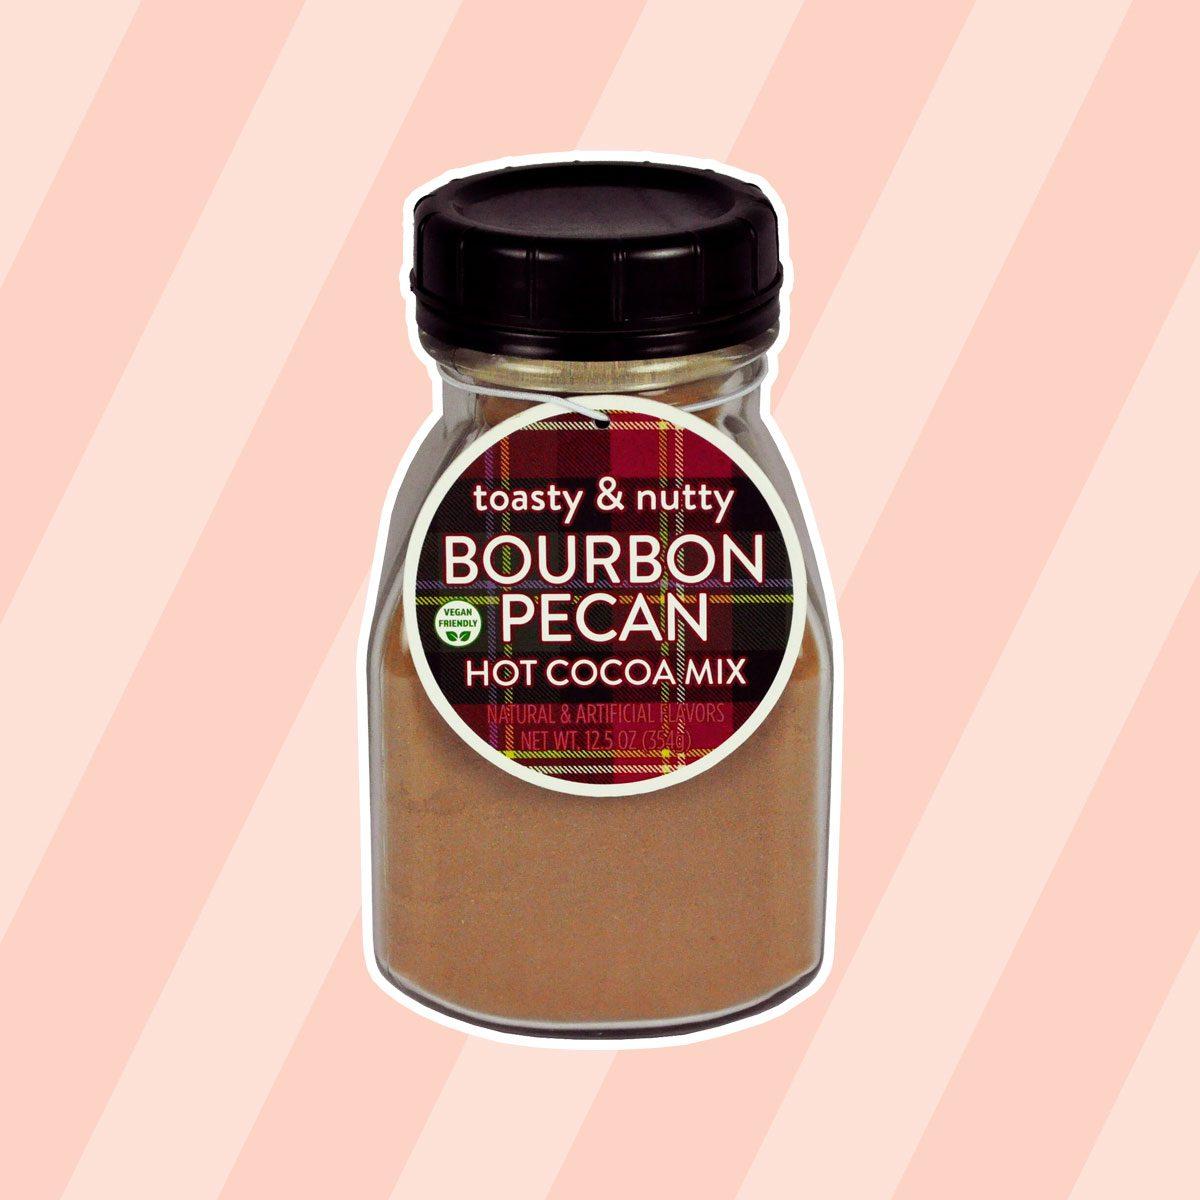 Toasty & Nutty Bourbon Pecan Hot Cocoa Mix Jar